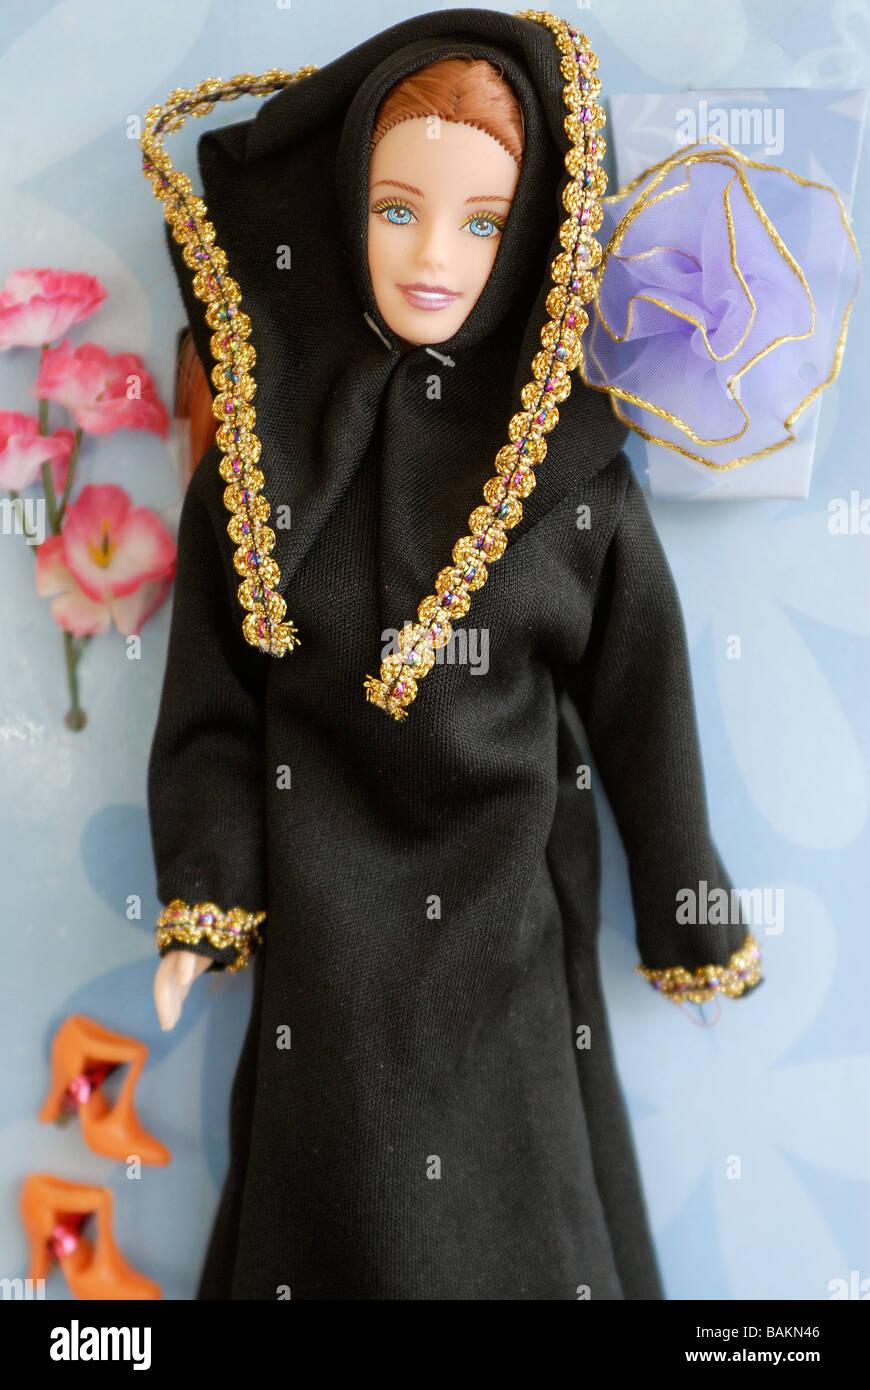 Middle Eastern barbie doll named Fulla, very popular in Arabic